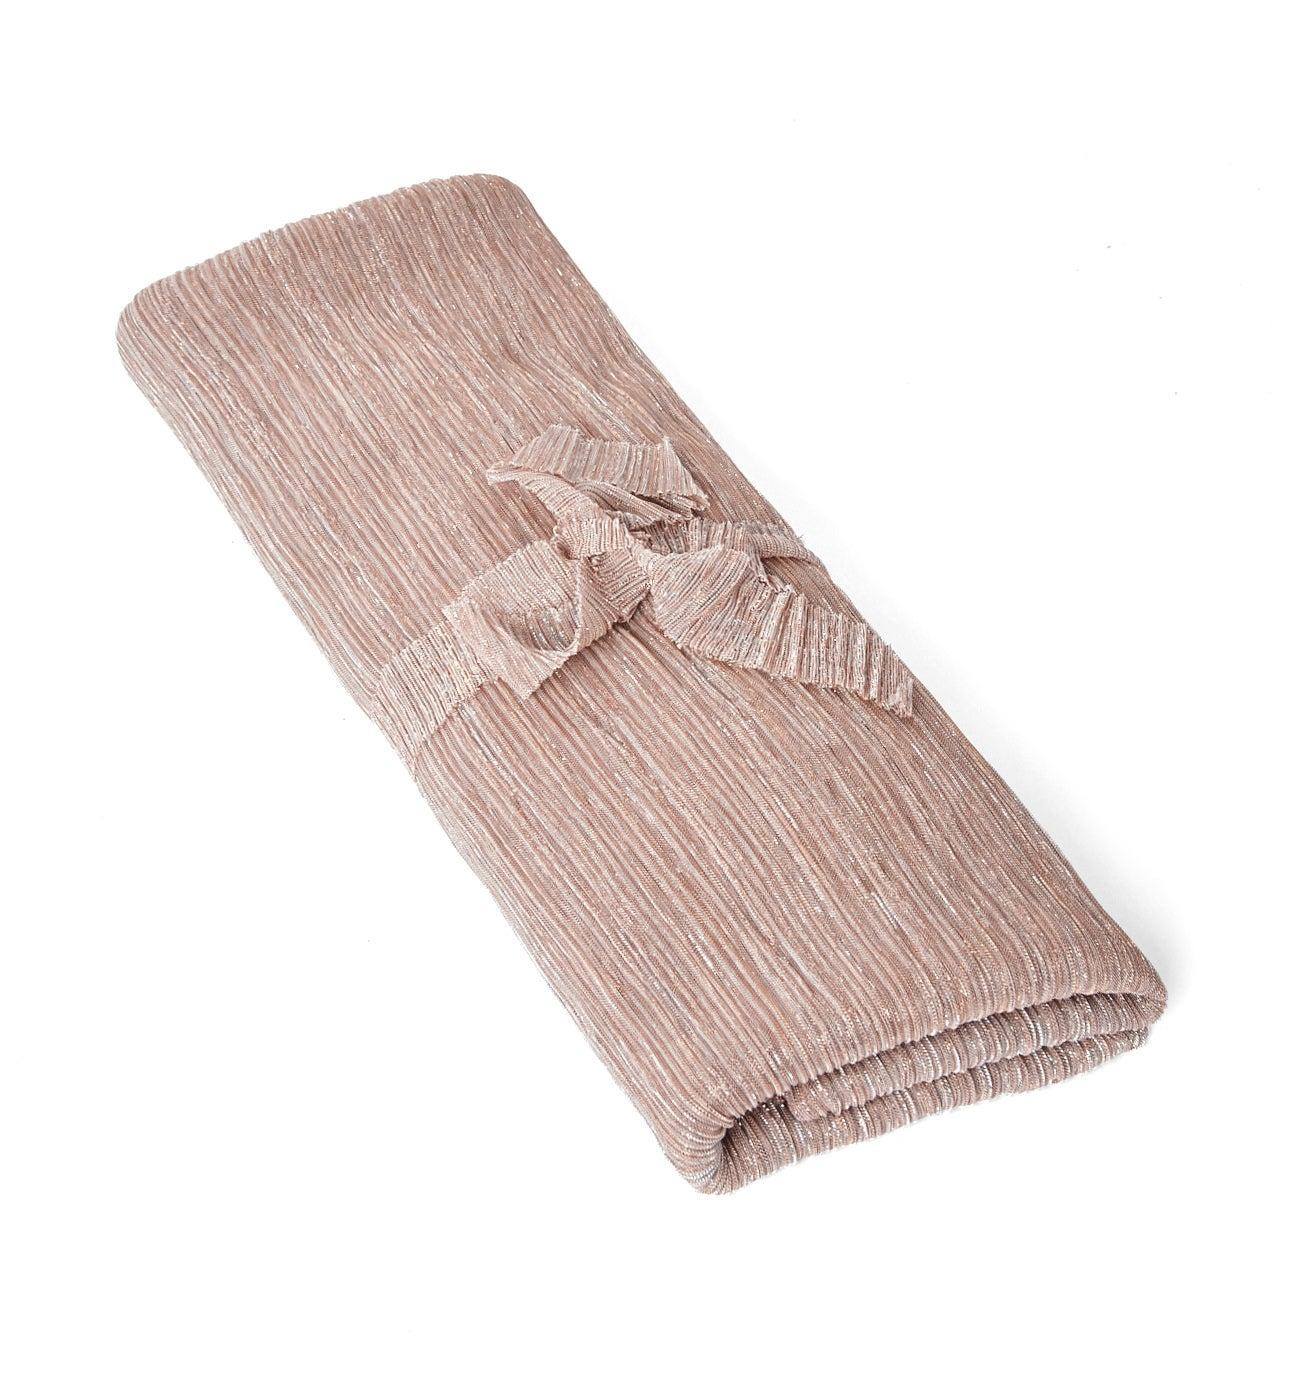 Coupon de tissu en tulle